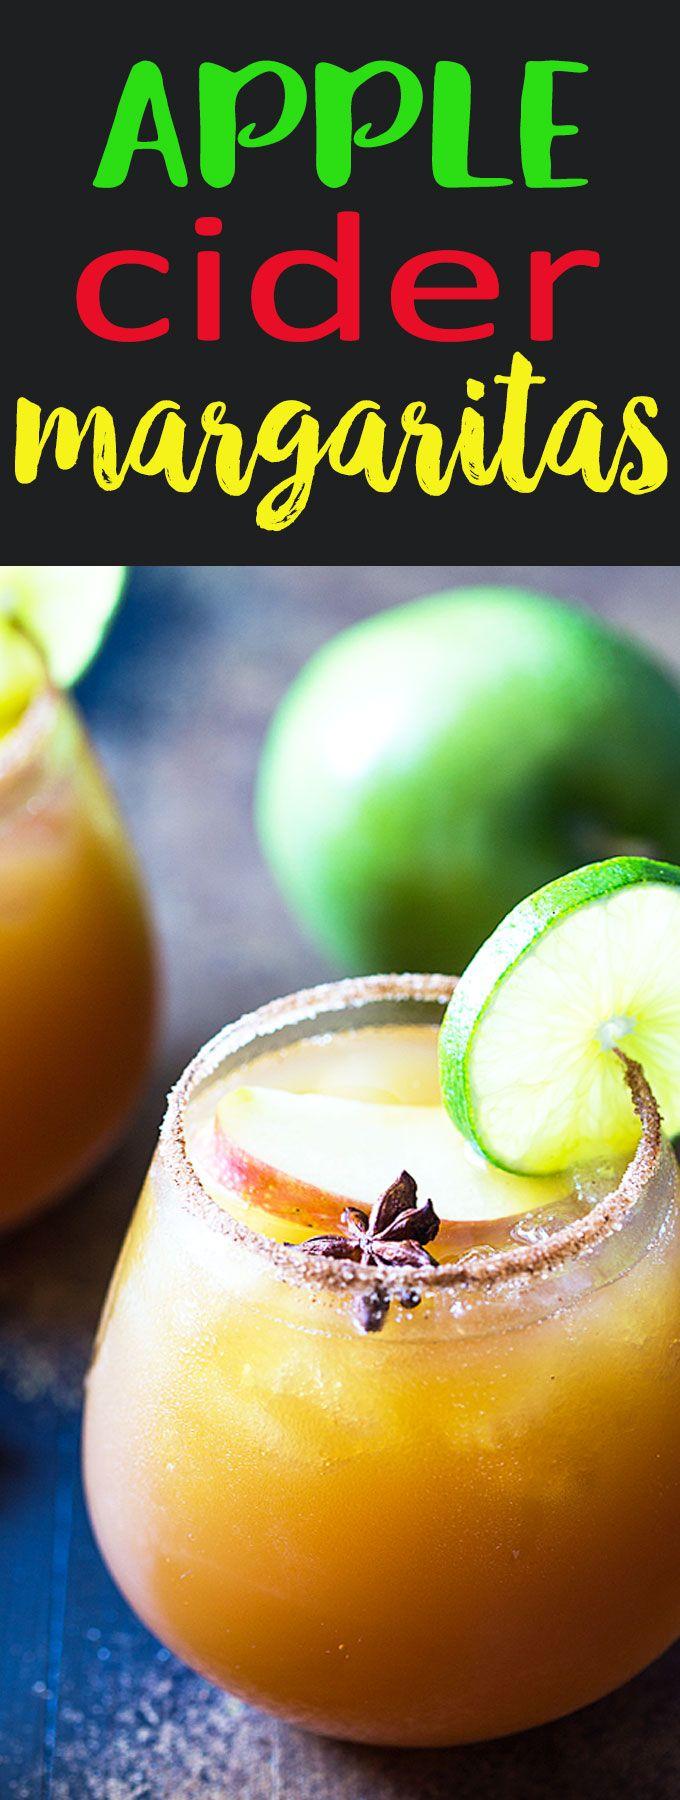 Apple Cider Margaritas - So sweet, tart and dangerously refreshing!